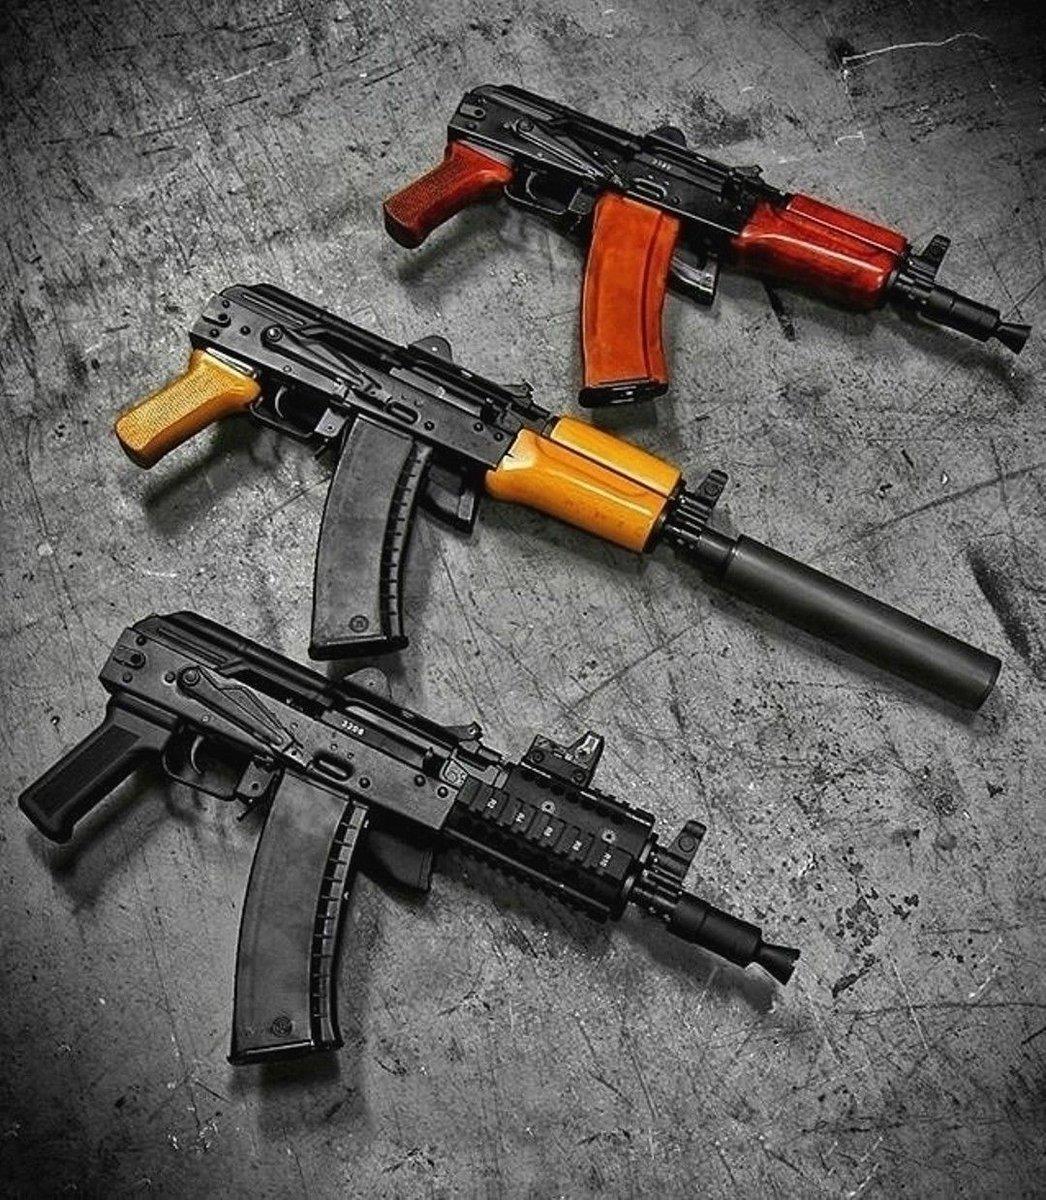 We wish you a #goodday with an #AK!  #kalashnikov #kalashlove #kalashwood #kalashworld #krink #pewpew #full30 #fullauto #mags #steel #firearms #weaponswow #gunz #gun #firearms #3guns #fullsemi #instagun #gunsofinsta #owngun #tacticallife #2a #kalash  Thanks to @guns.rights